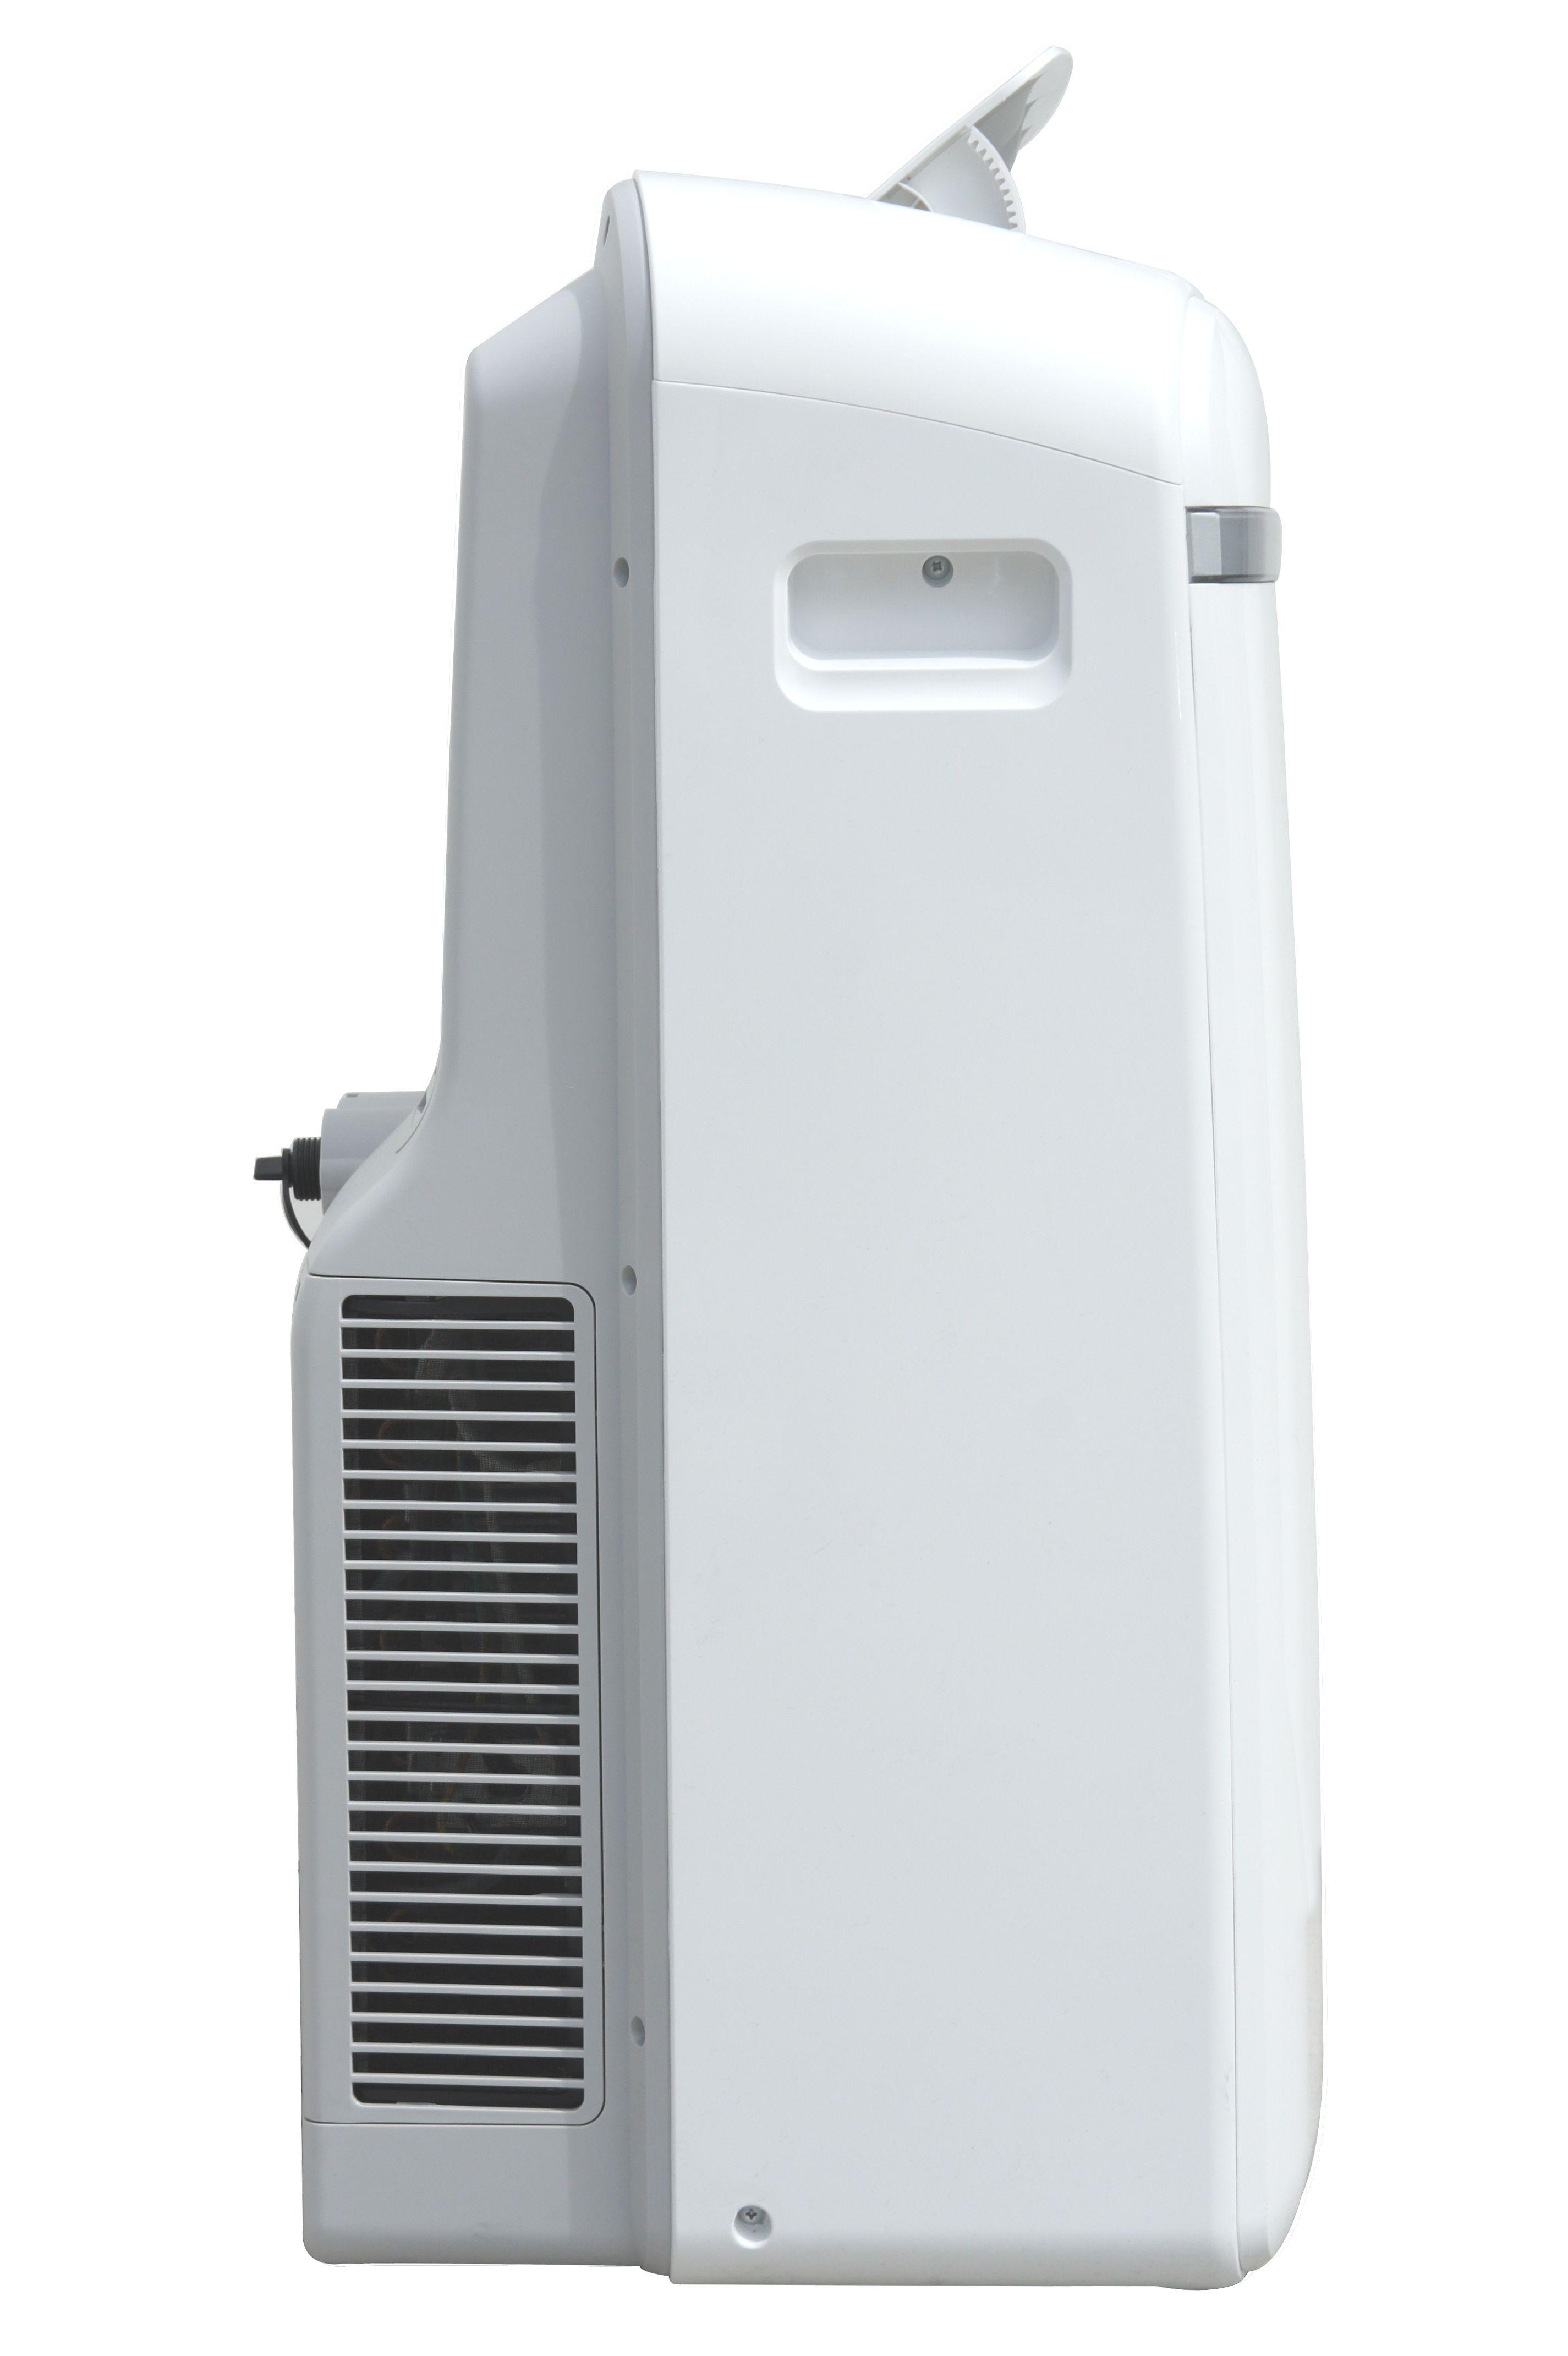 Sunpentown 14,000 BTU Portable Air Conditioner, White, WA